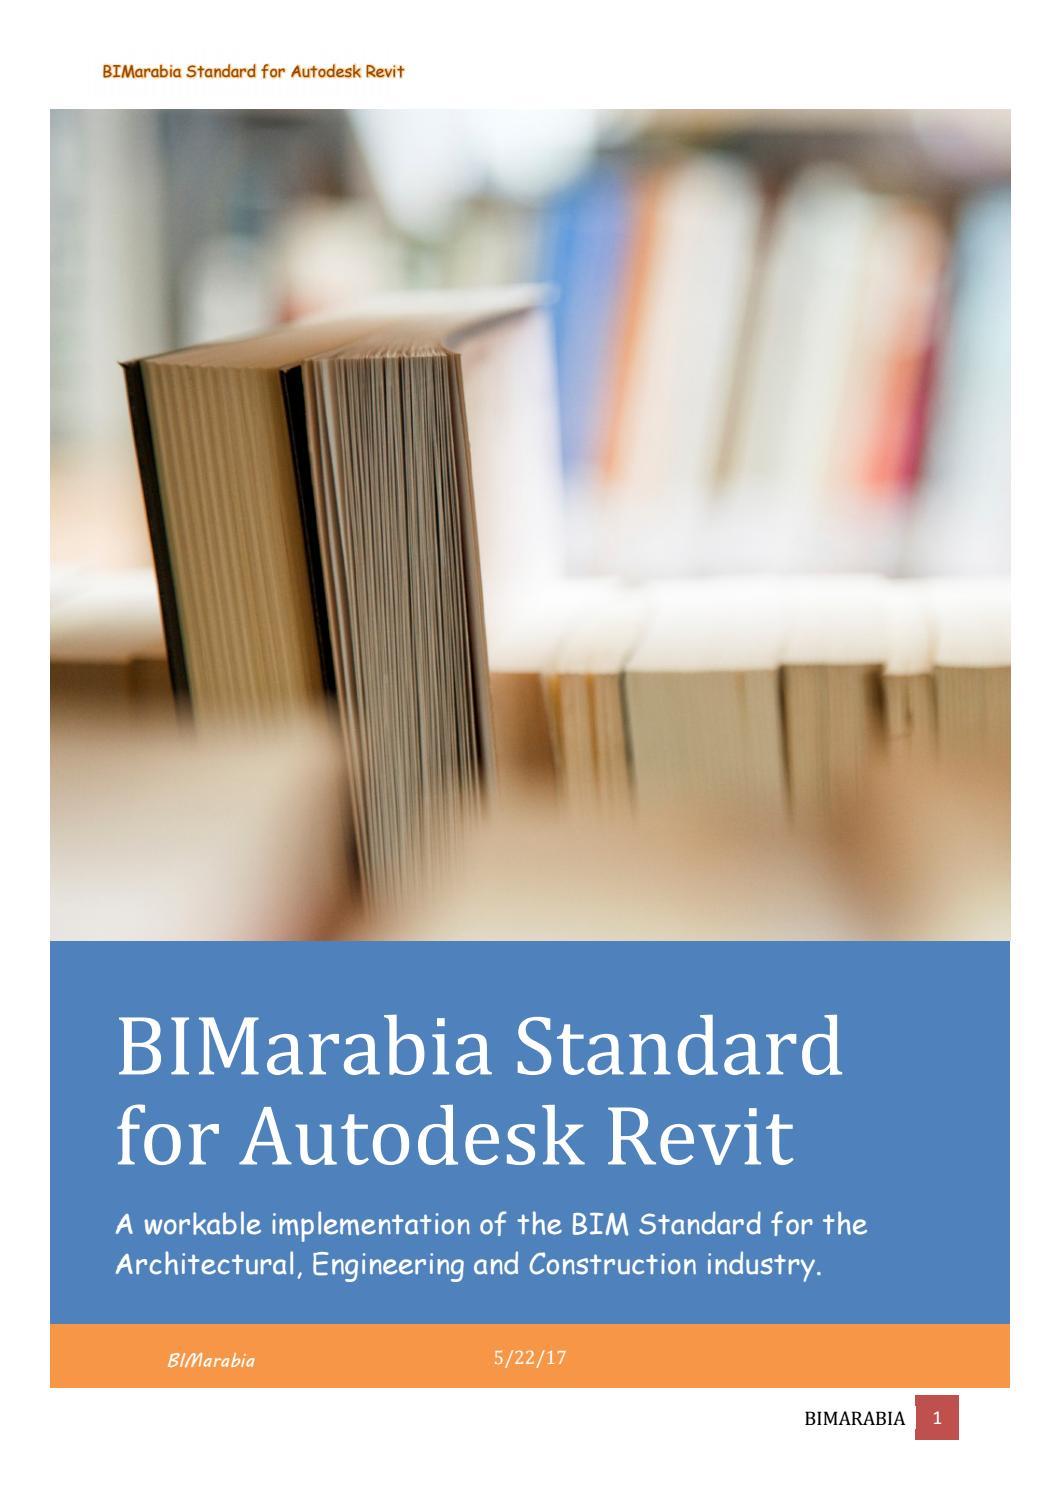 Bimarabia Standard For Autodesk Revit V1 0 By Bim Arabia Issuu